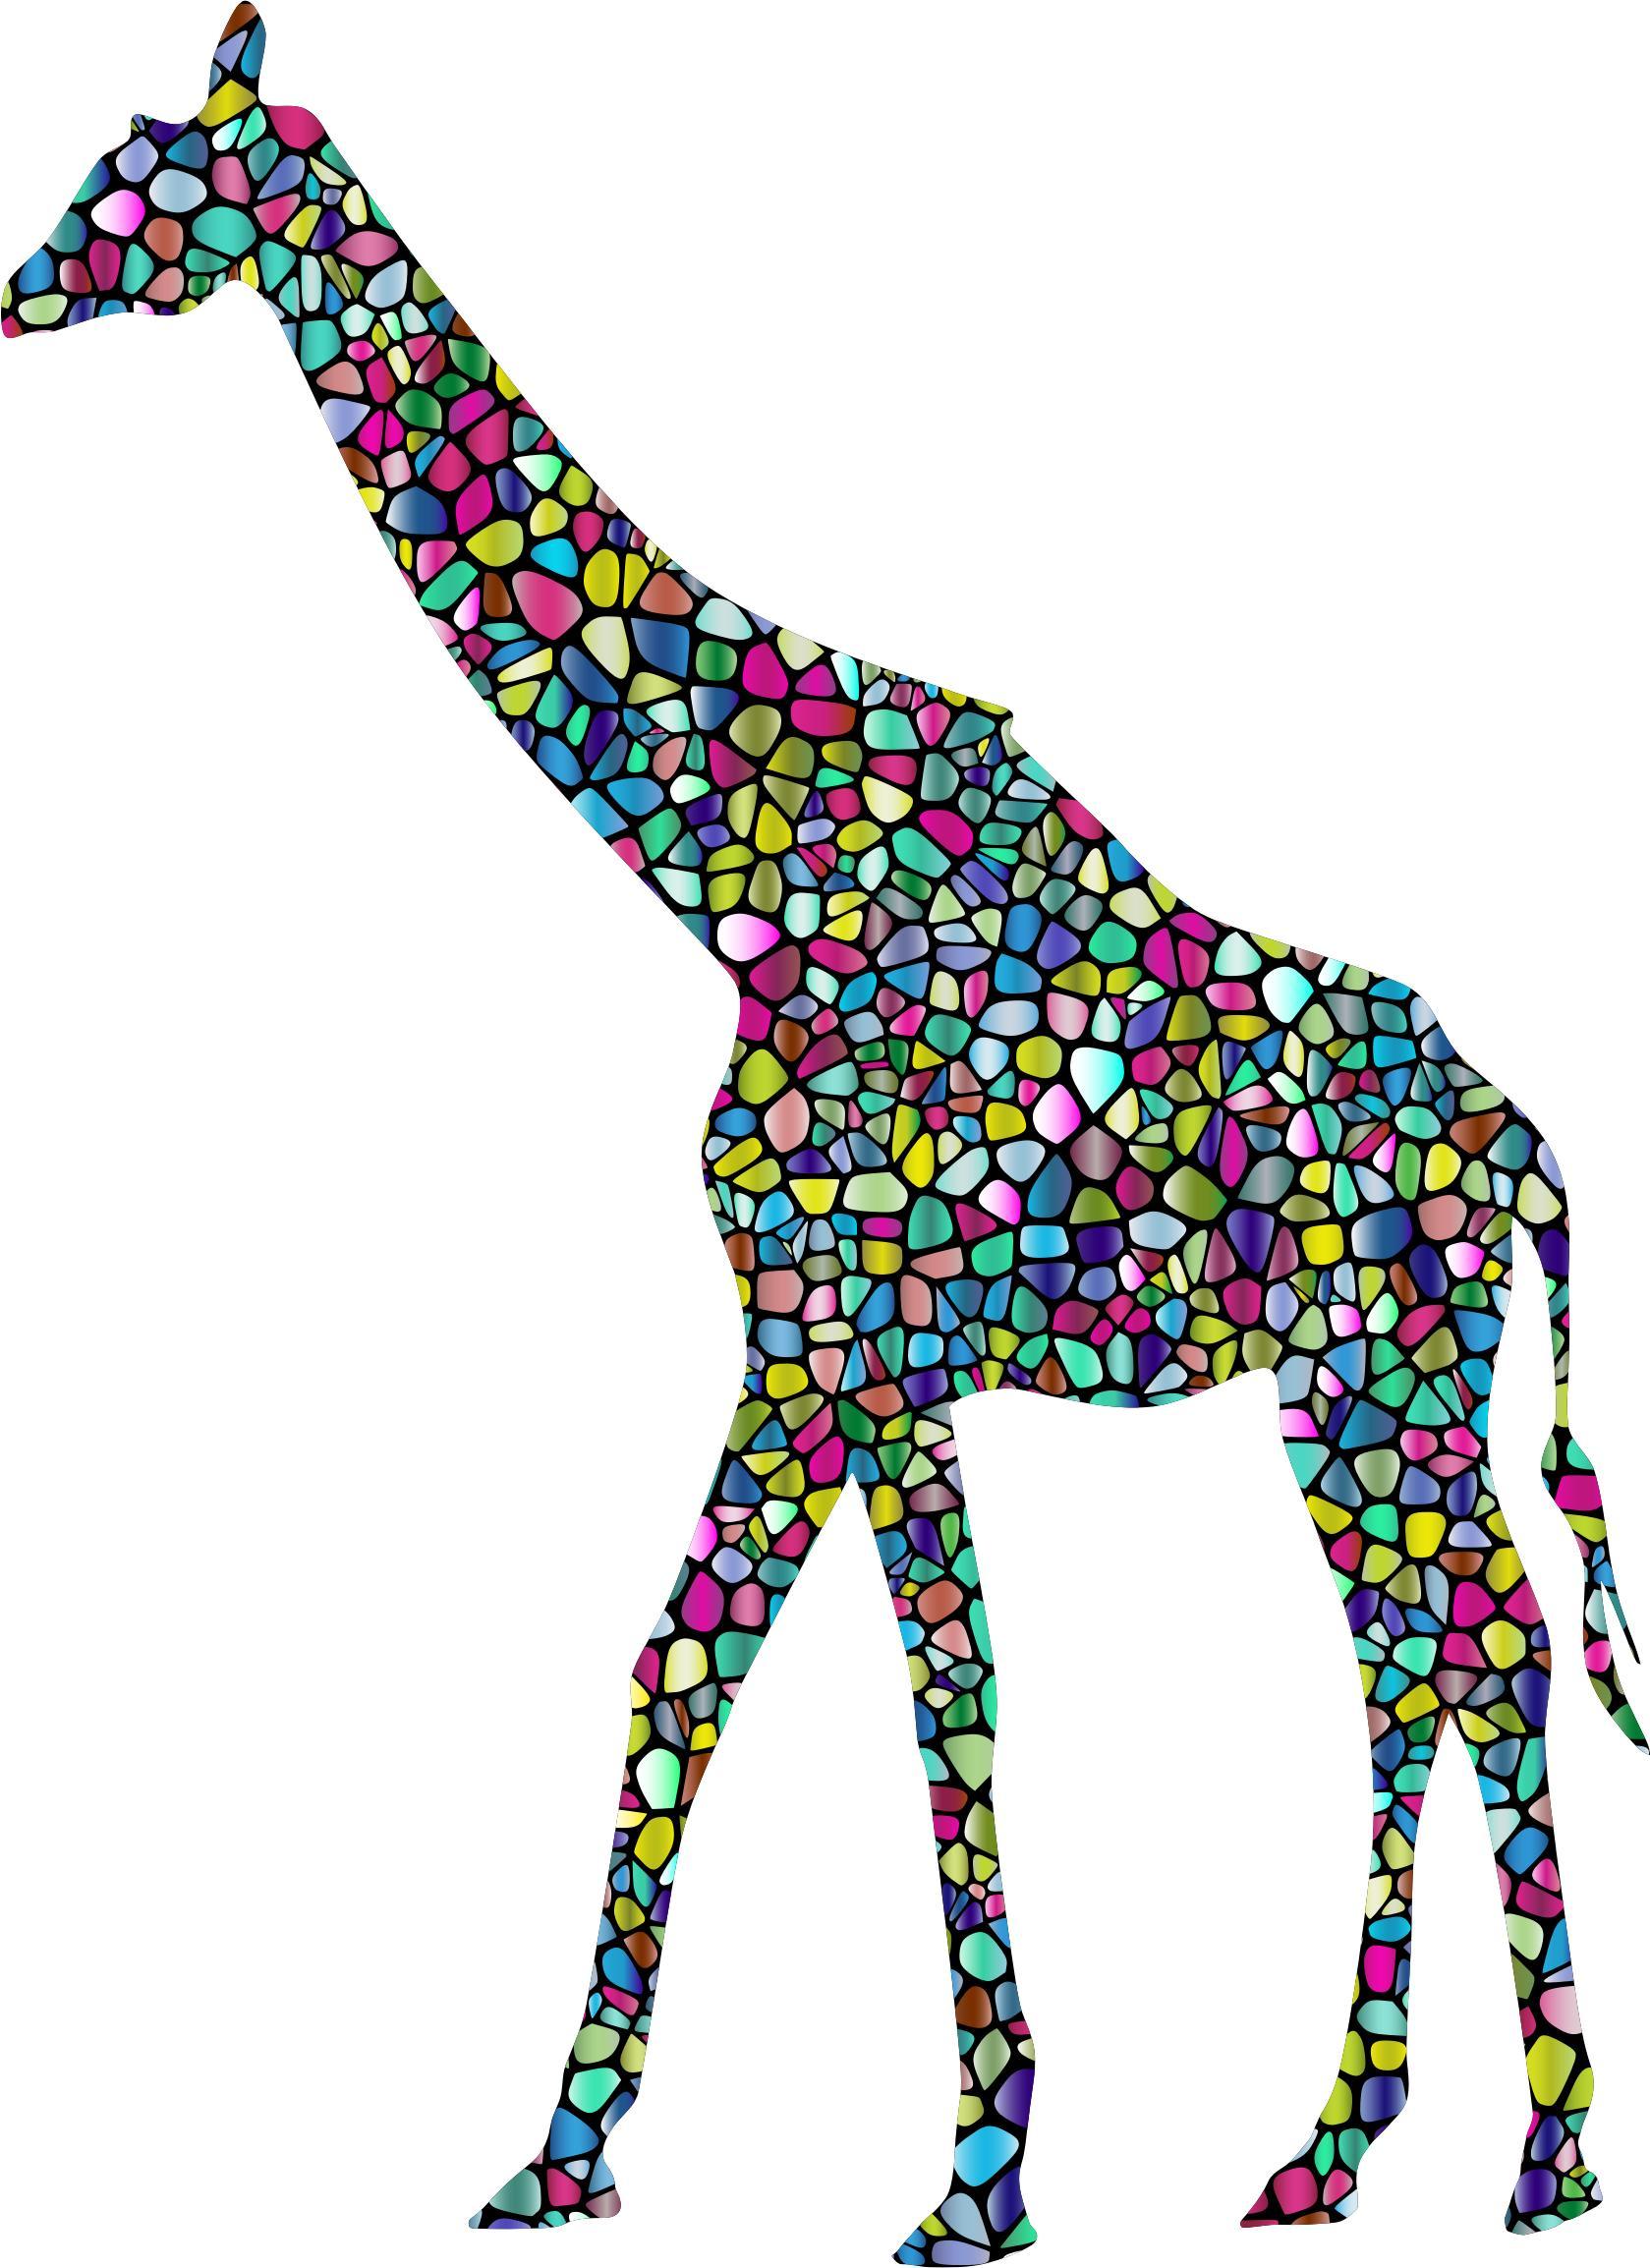 1679x2308 Polyprismatic Tiled Giraffe Landscape Silhouette Minus Landscape